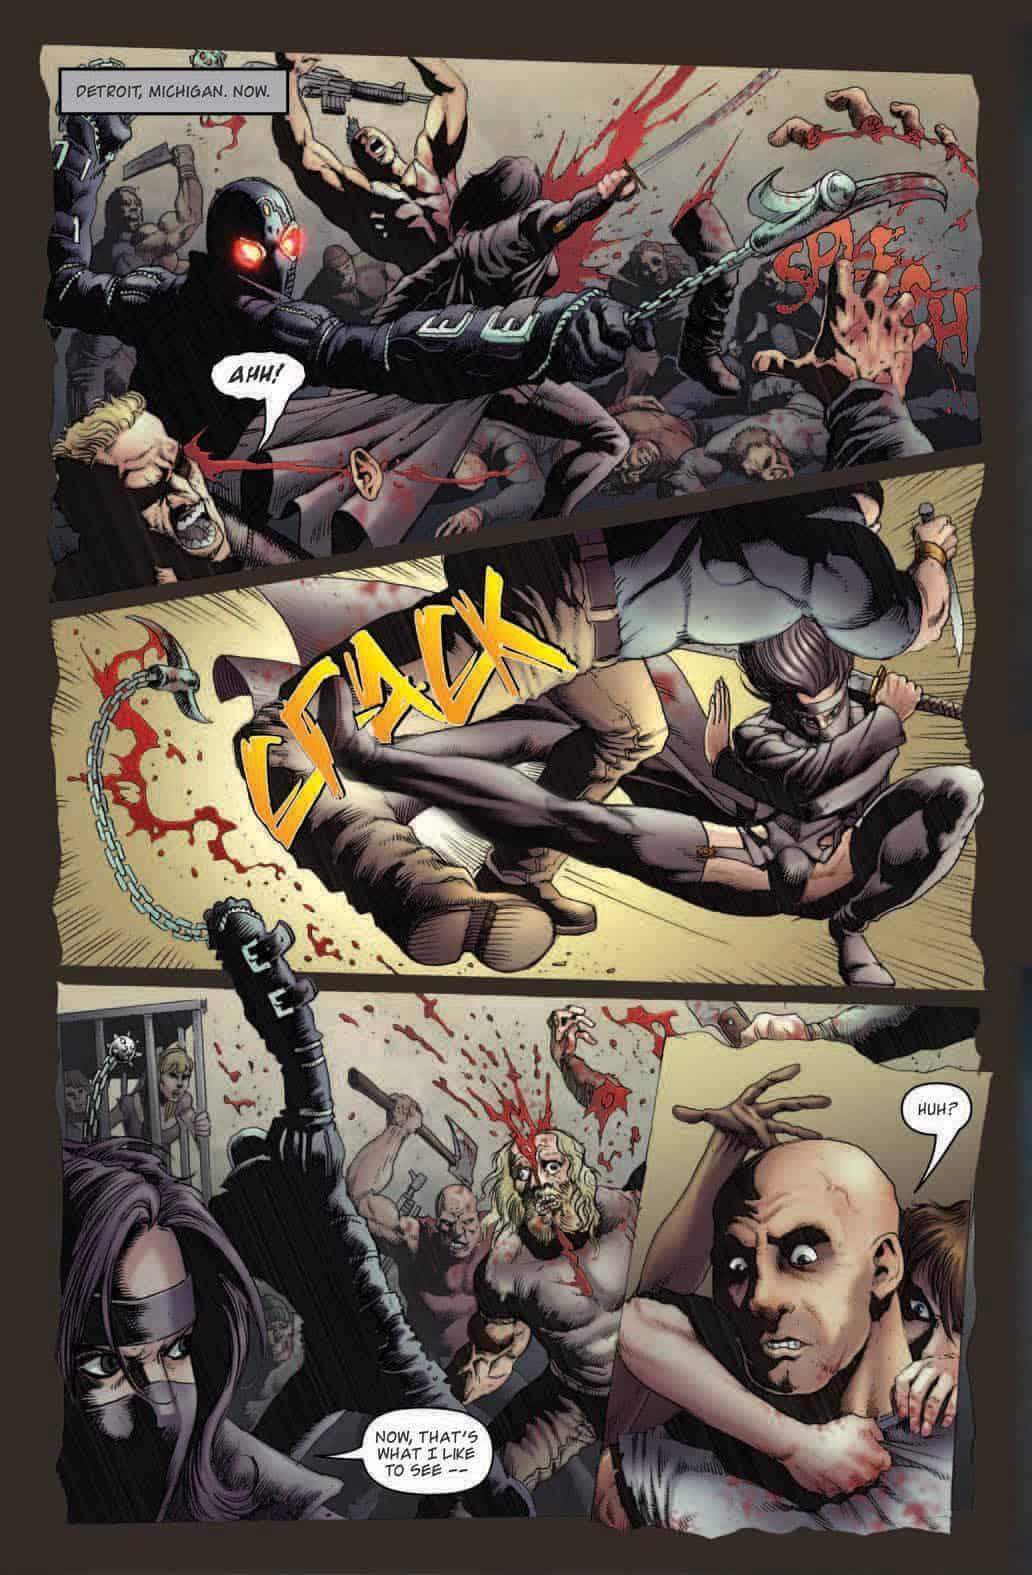 Simmons-Comics-Anthology-Vol-2-image-01